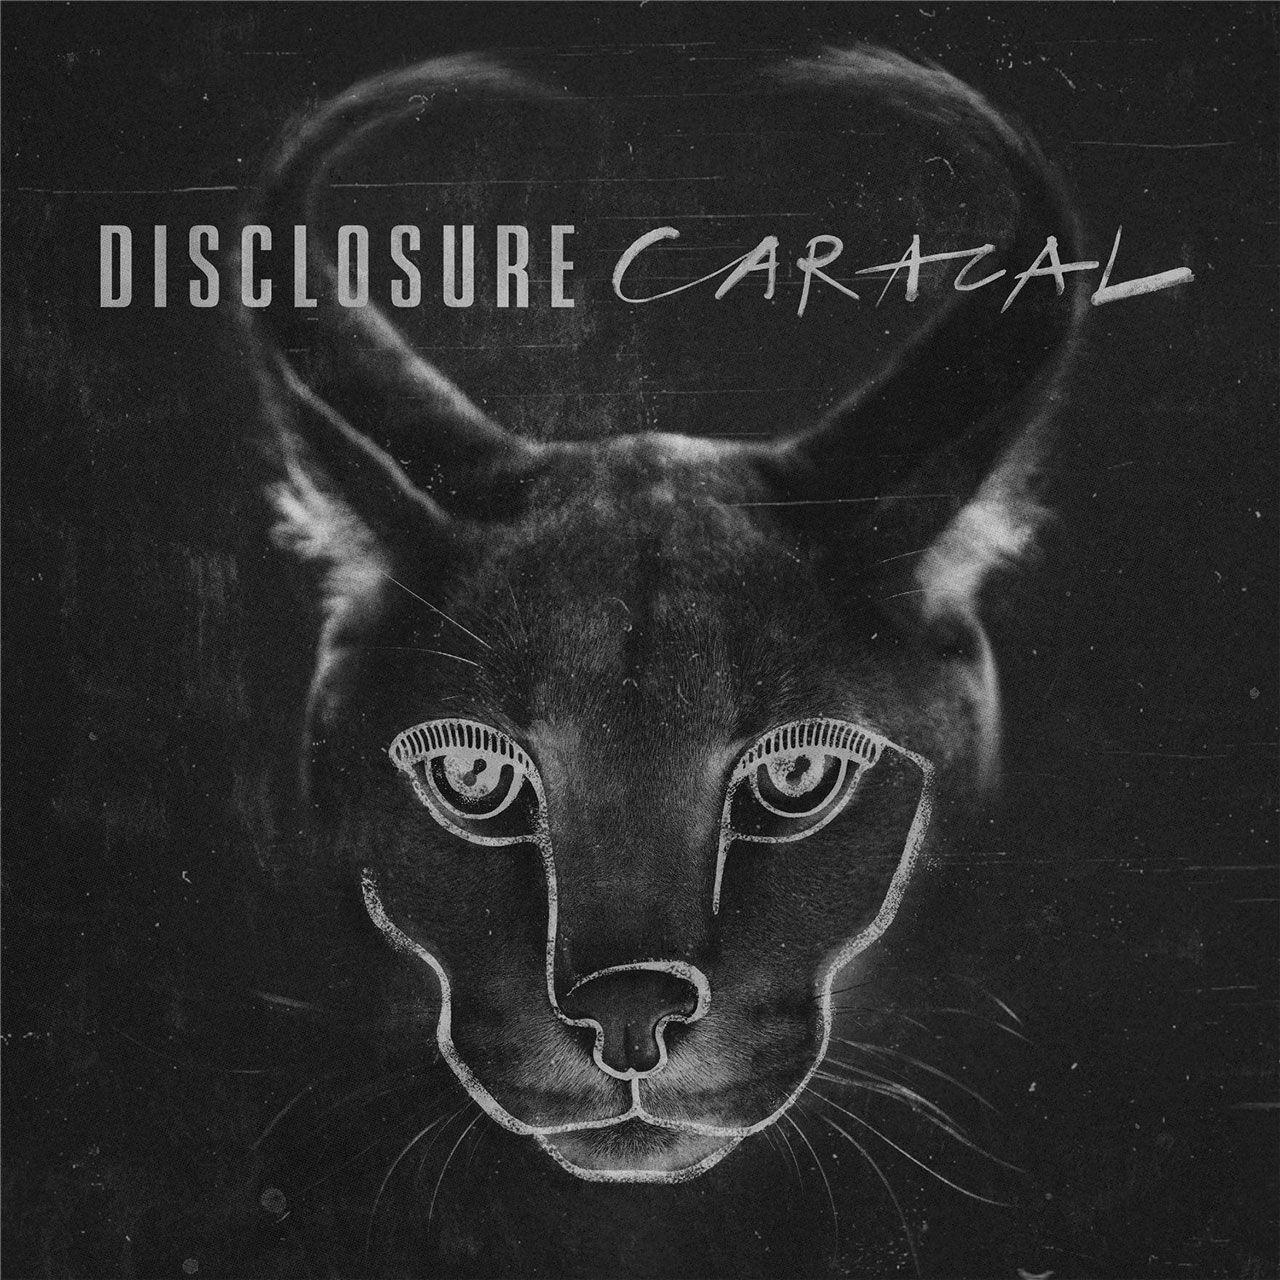 Disclosures nya album är här